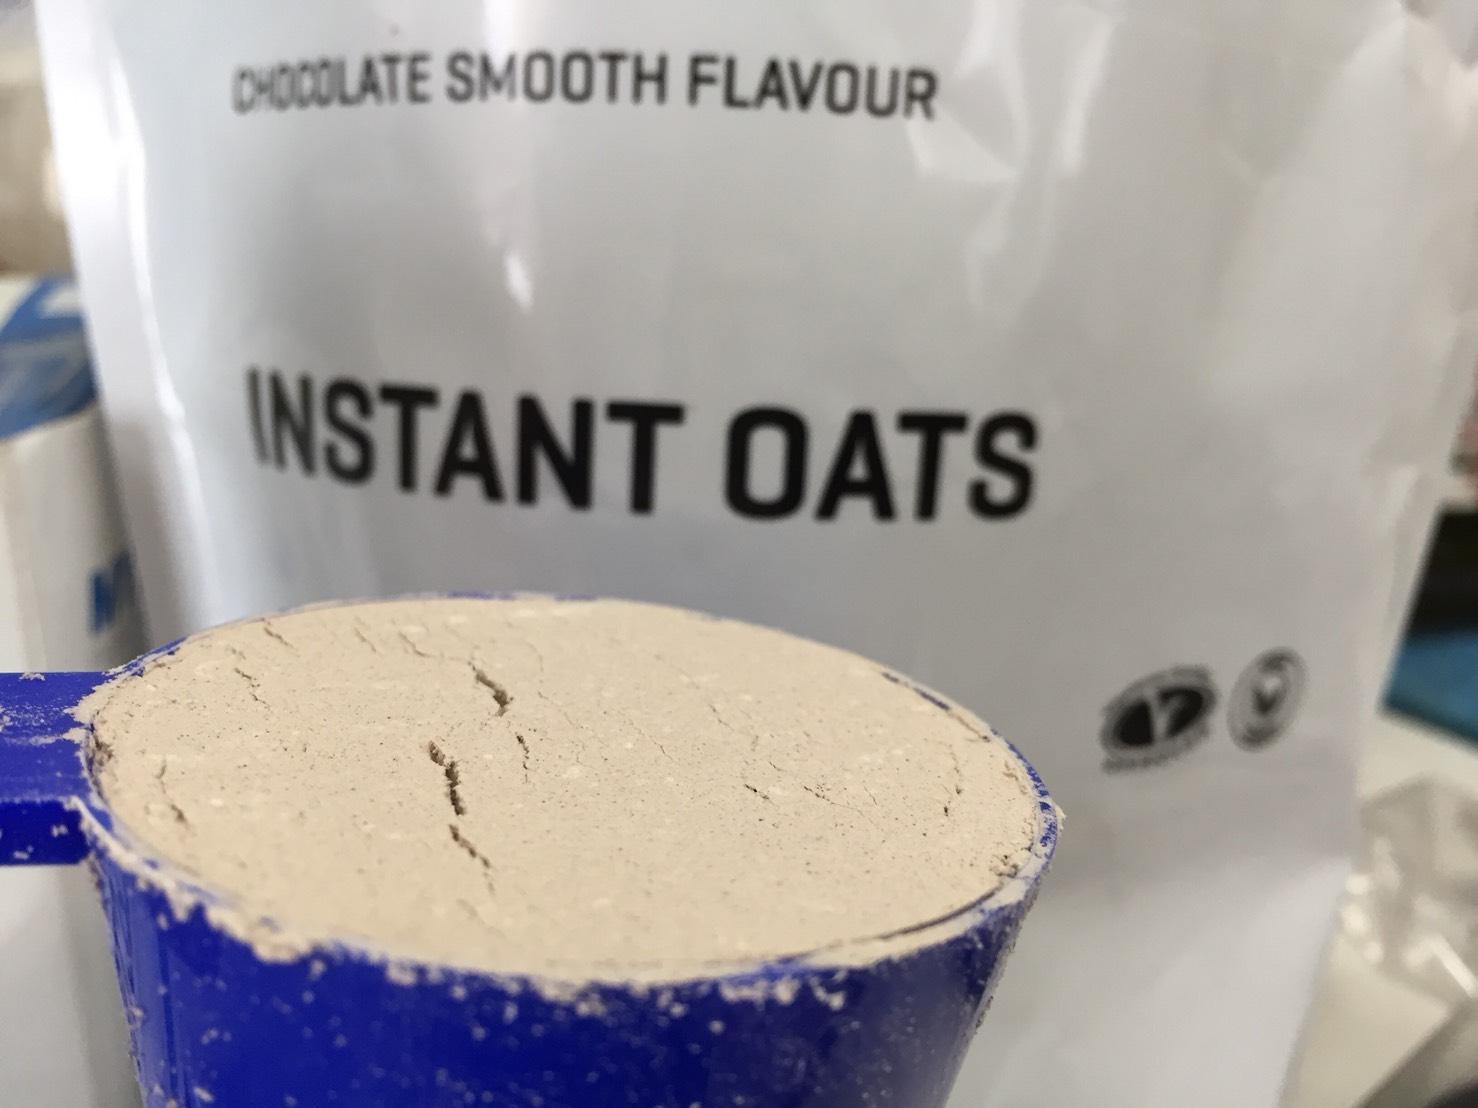 INSTANT OATS(インスタントオーツ)「CHOCOLATE SMOOTH FLAVOUR(チョコレートスムース味)」をスプーン摺り切り一杯にした様子